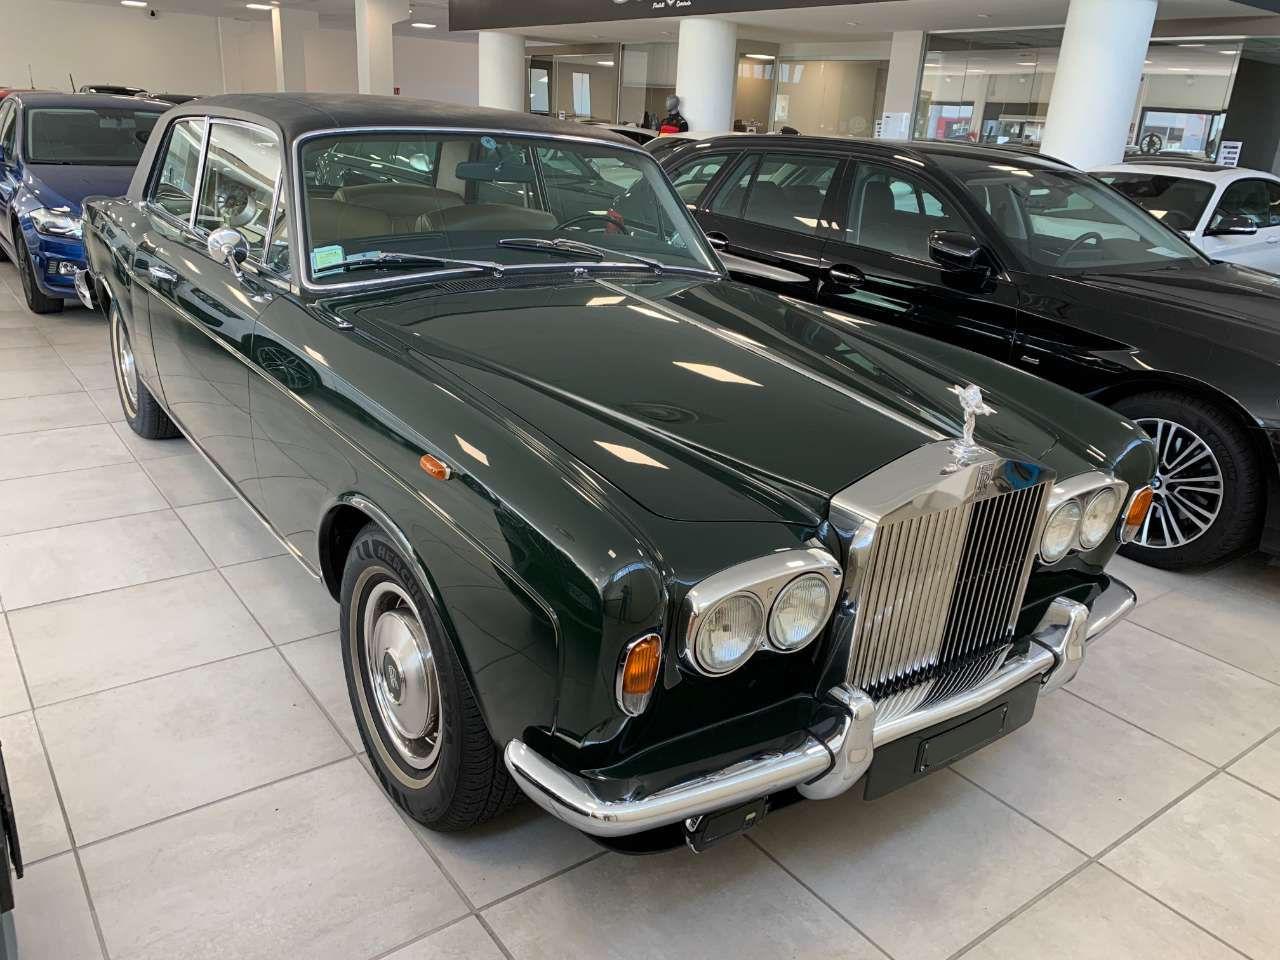 Rolls Royce Corniche Coupé